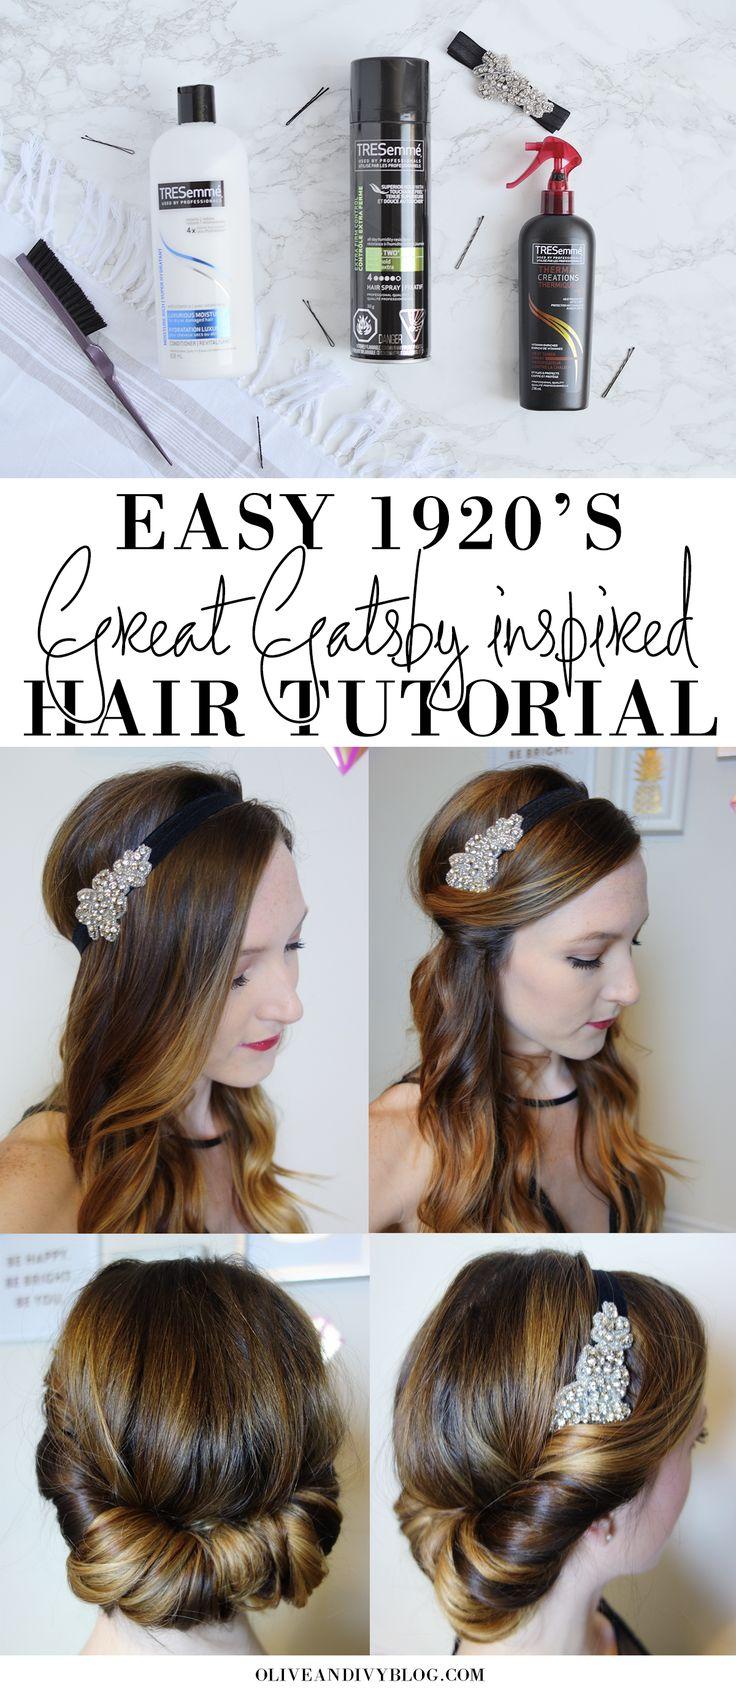 Marvelous 1000 Ideas About 1920S Hair Tutorial On Pinterest Quick Short Hairstyles Gunalazisus